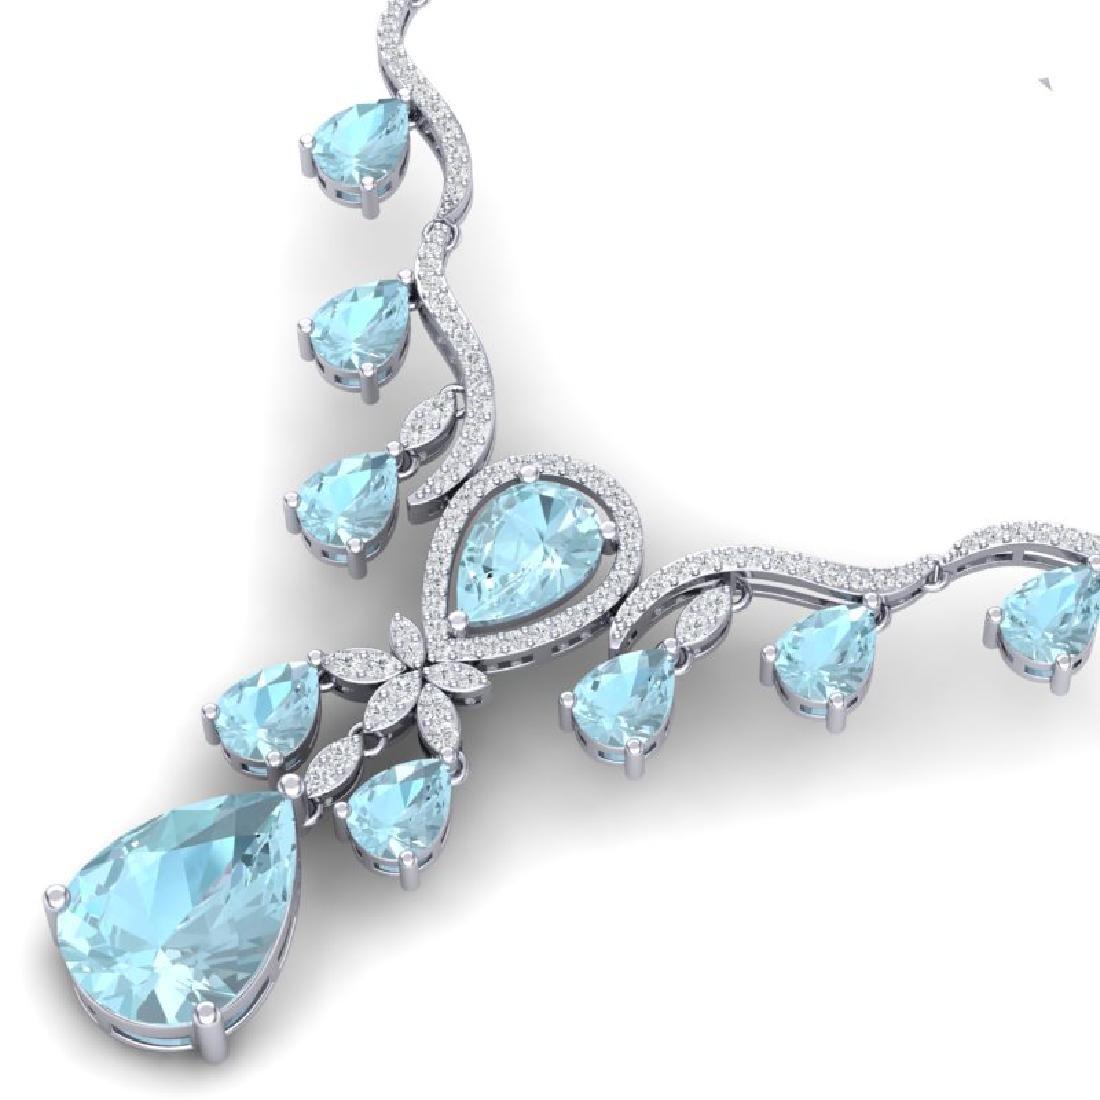 38.14 CTW Royalty Sky Topaz & VS Diamond Necklace 18K